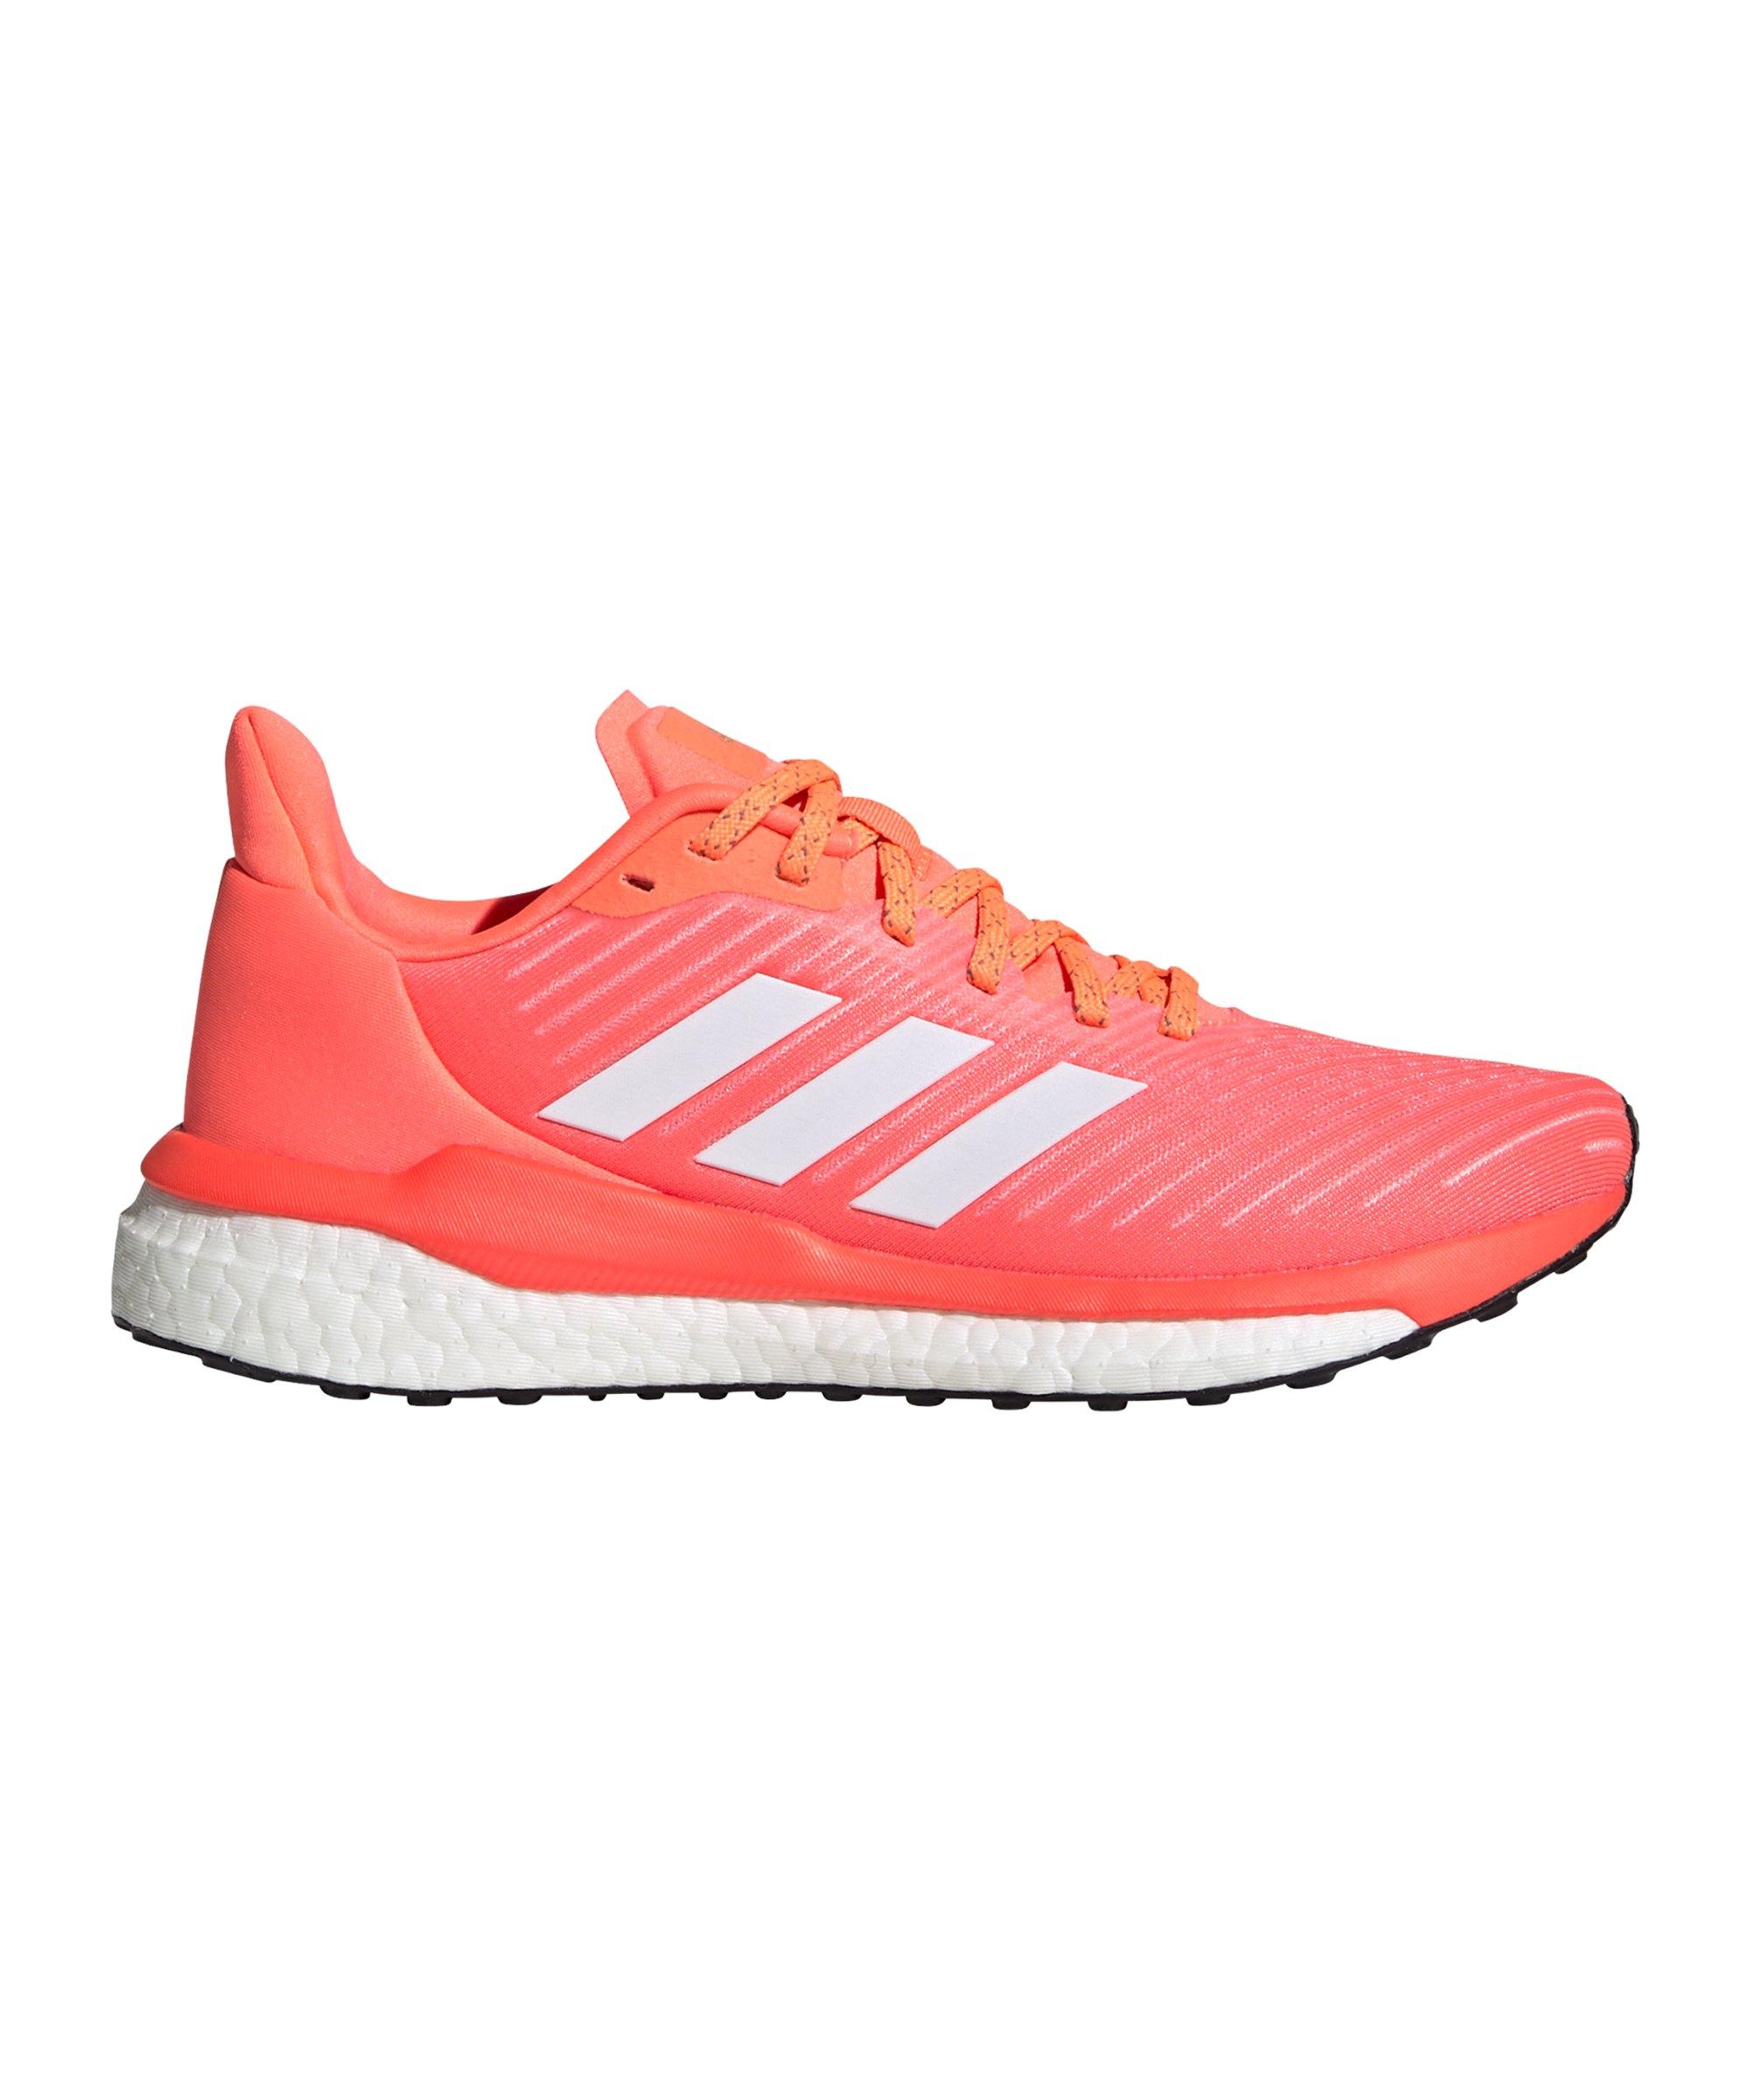 adidas Solar Drive 19 Running Damen Pink - pink